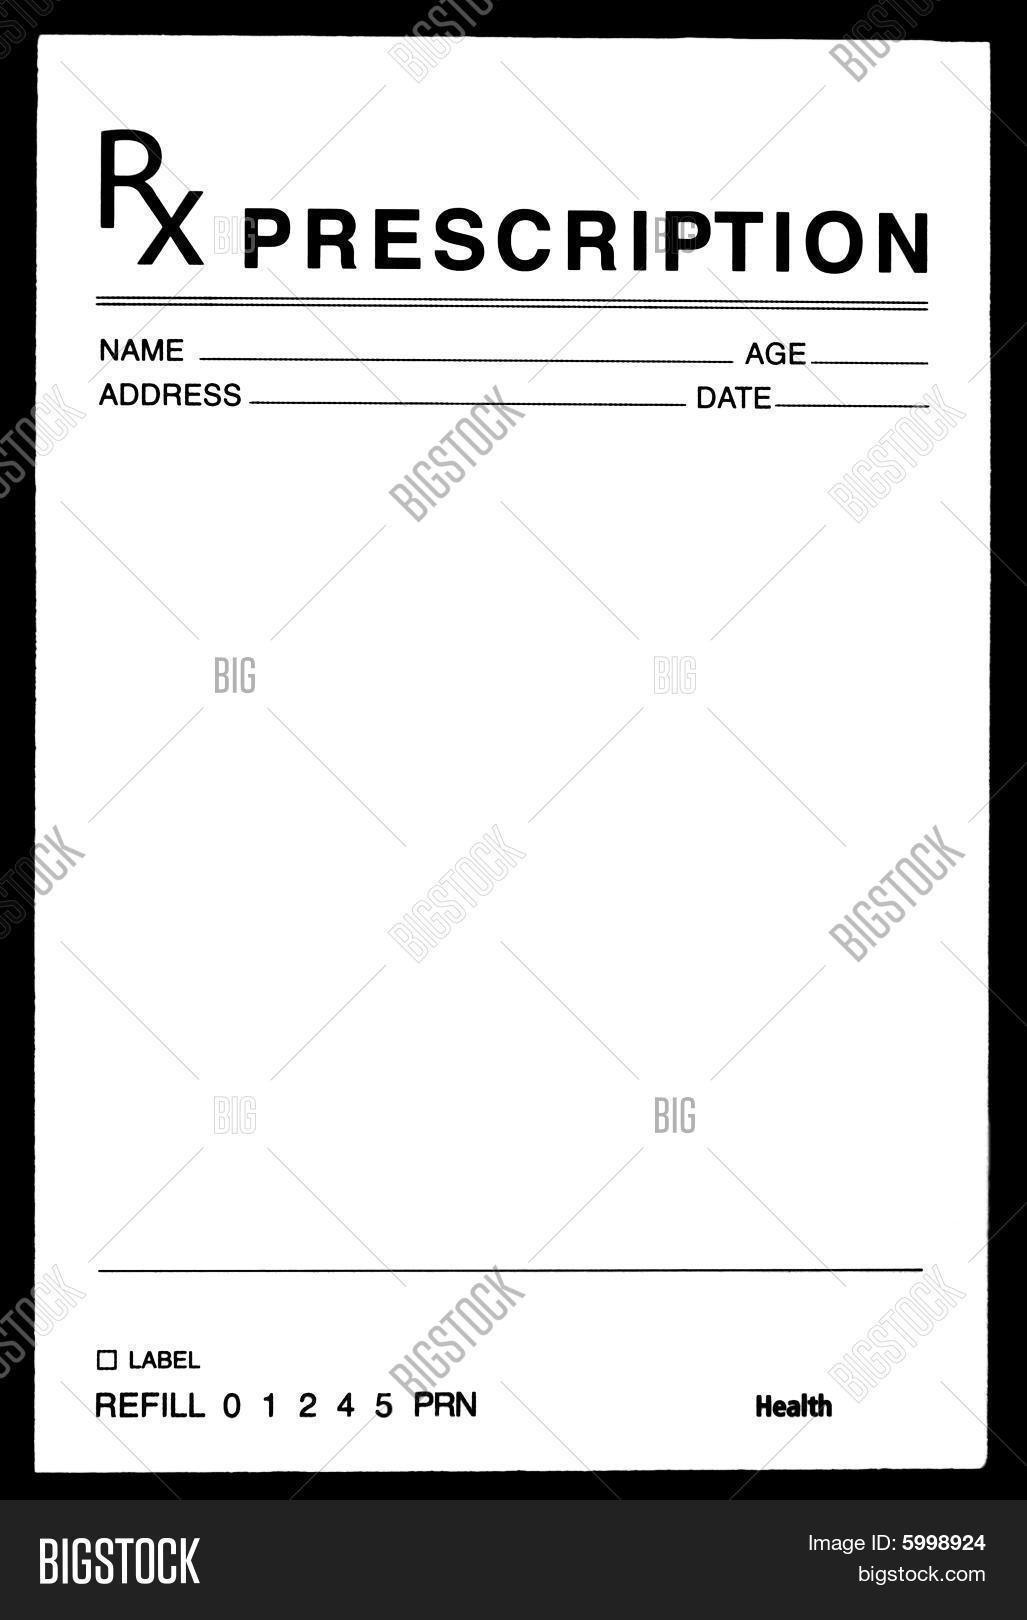 Prescription Pad Template Microsoft Word Blank Prescription form Image Cg5p C